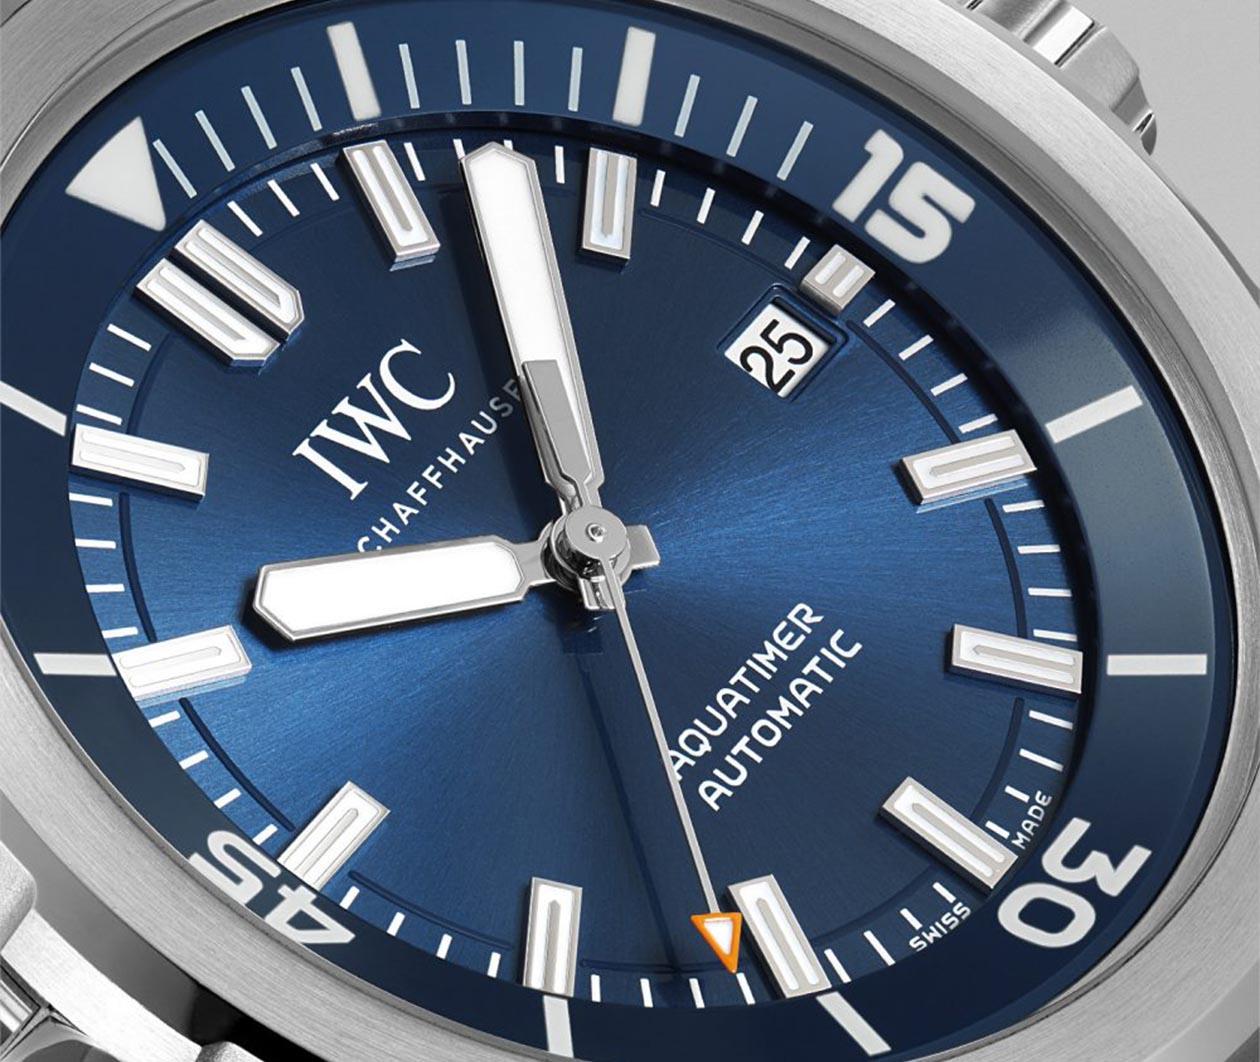 IWC Aquatimer AutomaticEditionExpeditionJacquesYvesCousteau IW329005 Carousel 4 FINAL